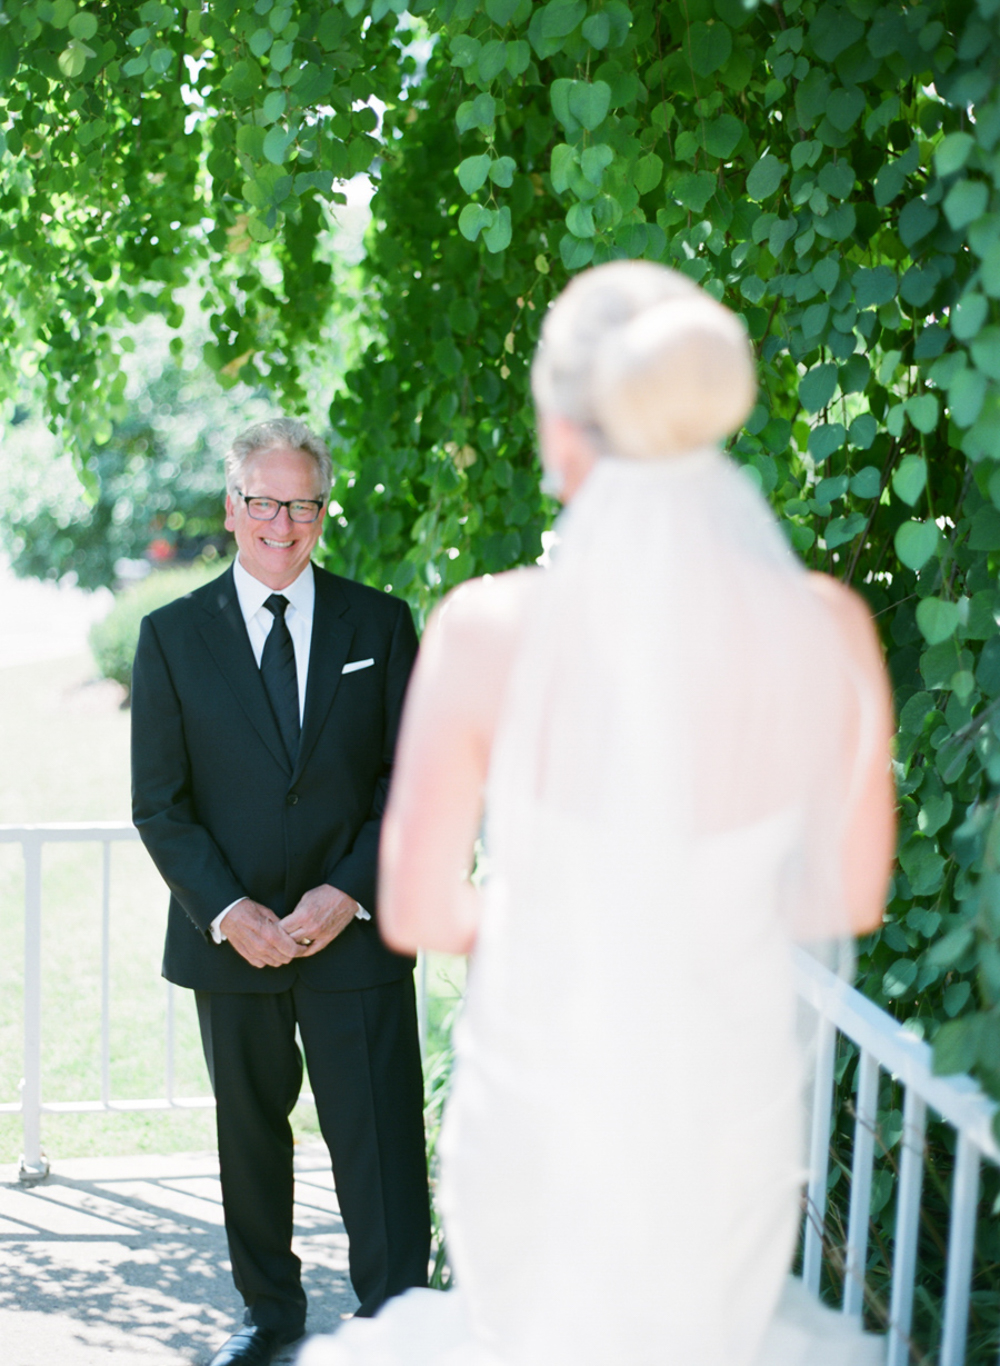 About_Thyme_Farm_Door_County_Wedding_008.jpg